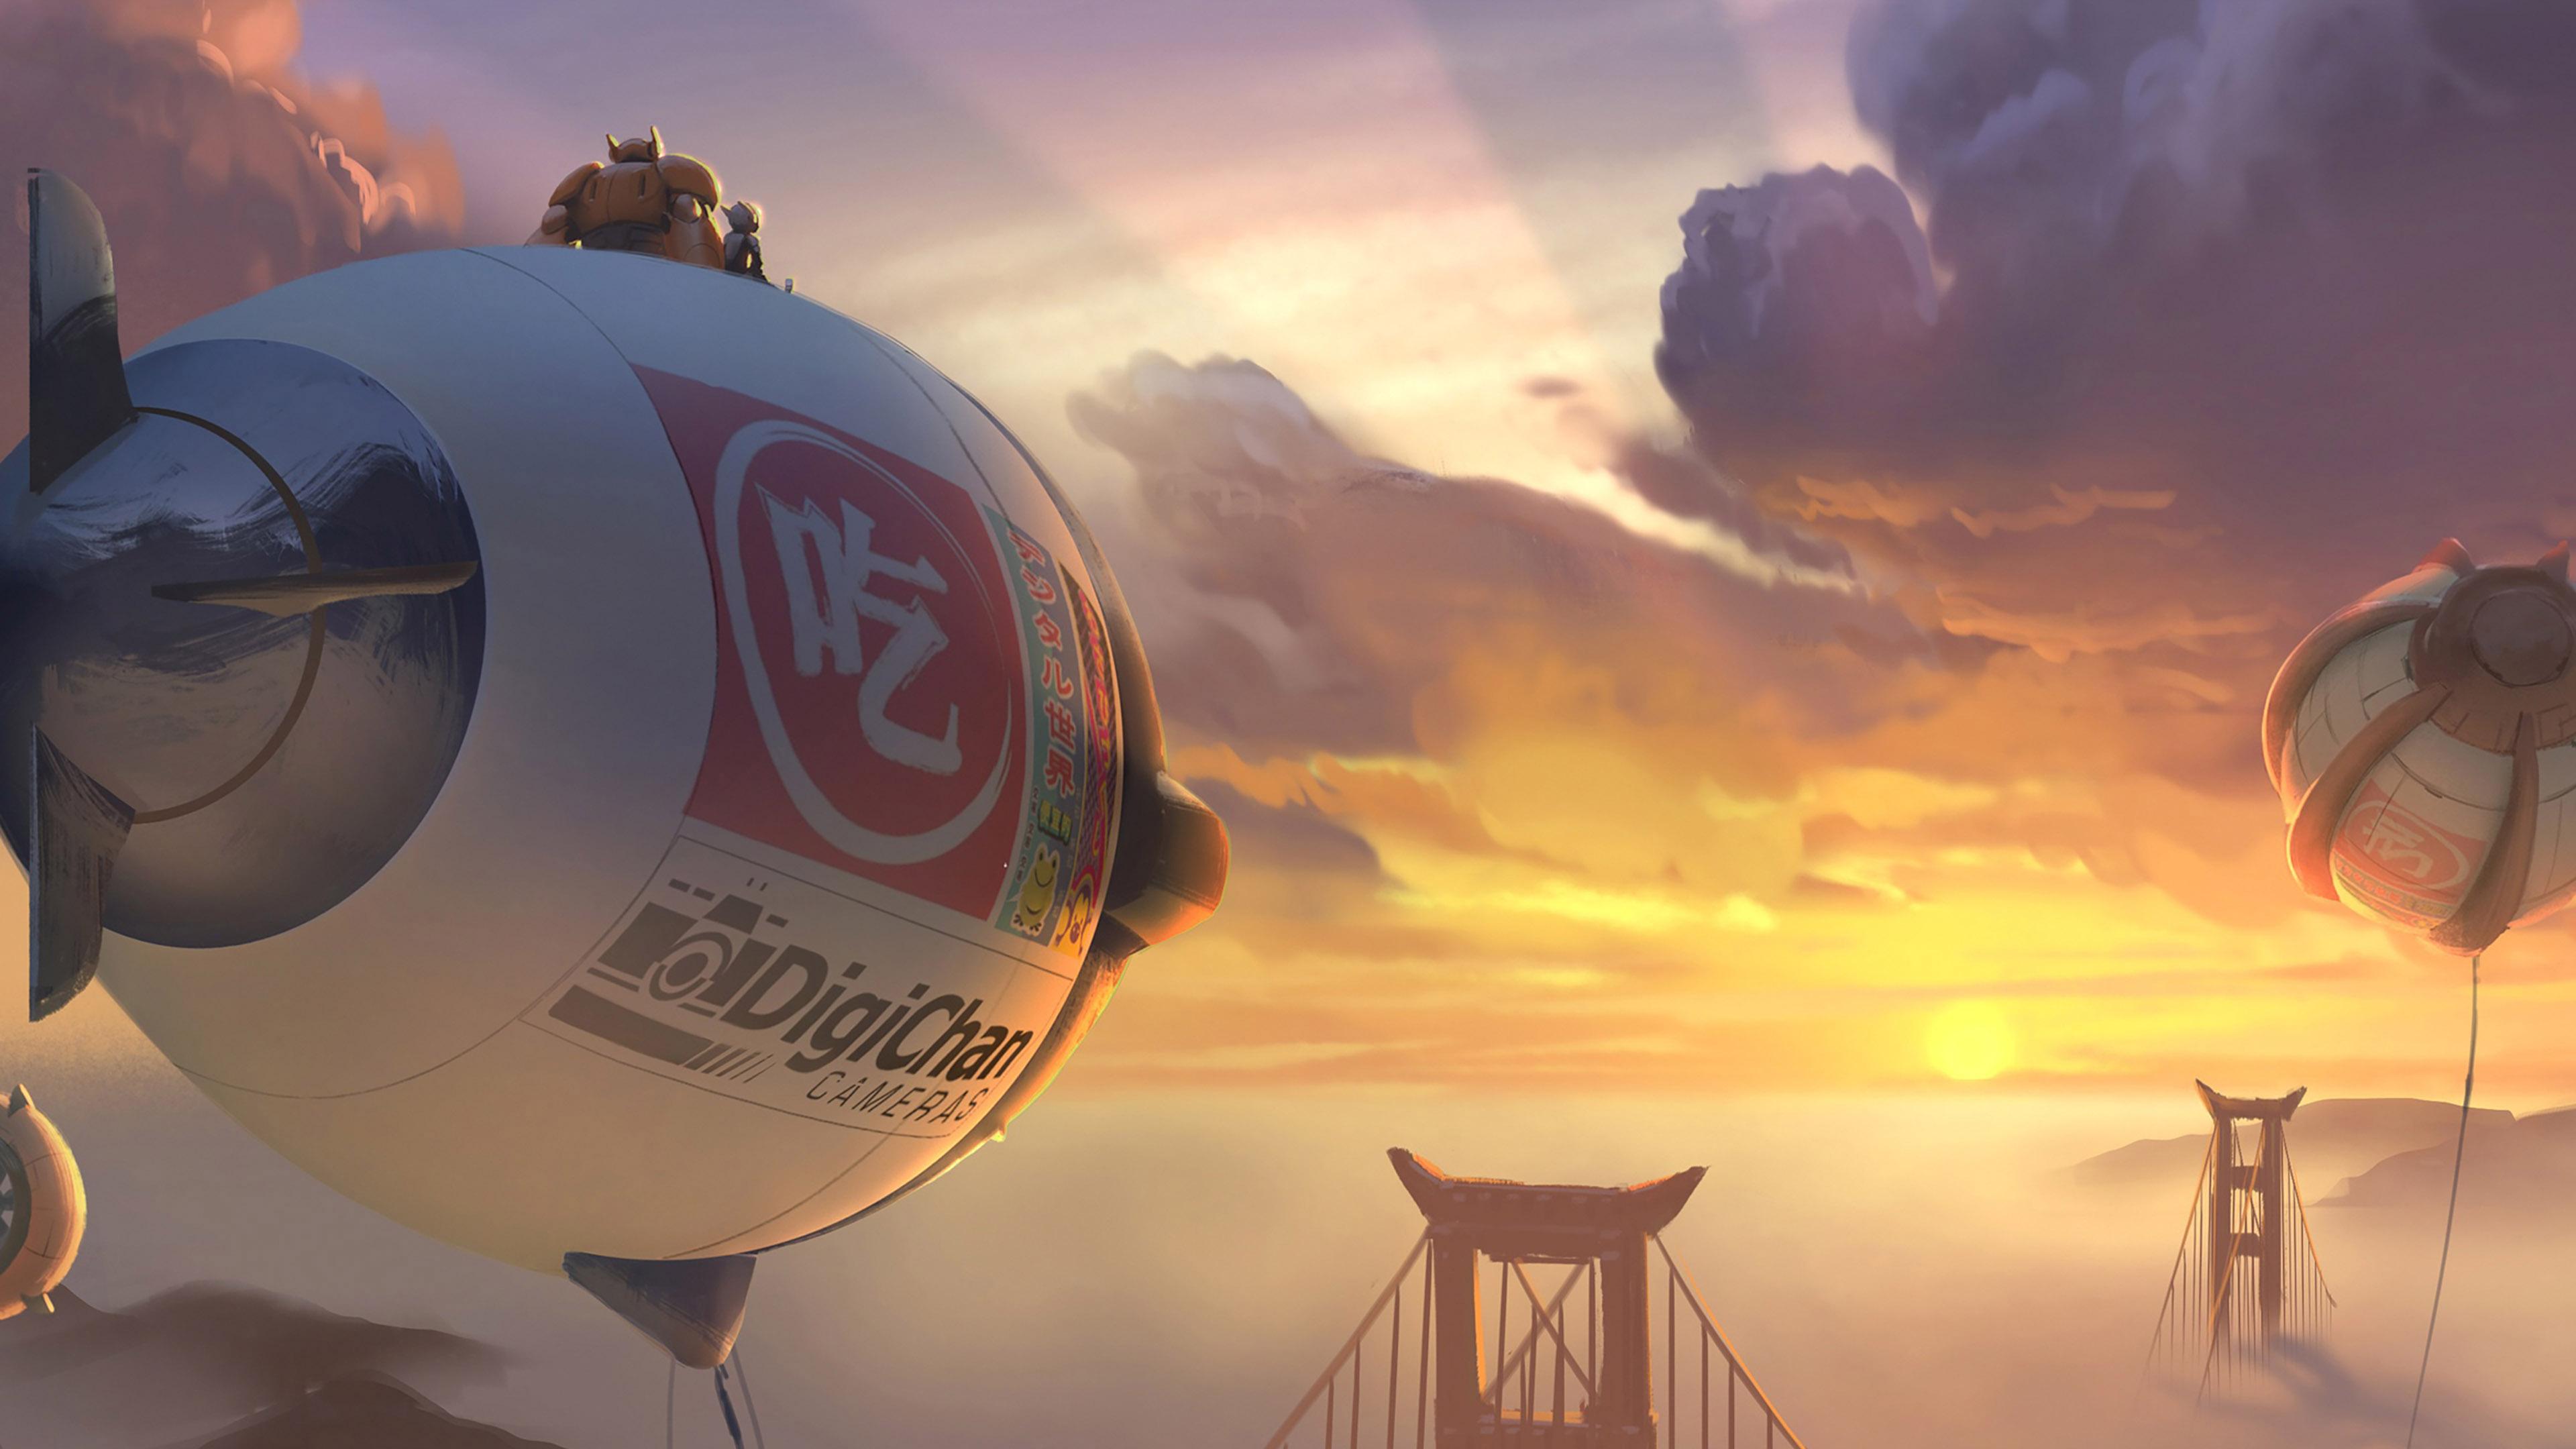 Af88 Big Hero 6 Fly Air Disney Art Illust Papers Co